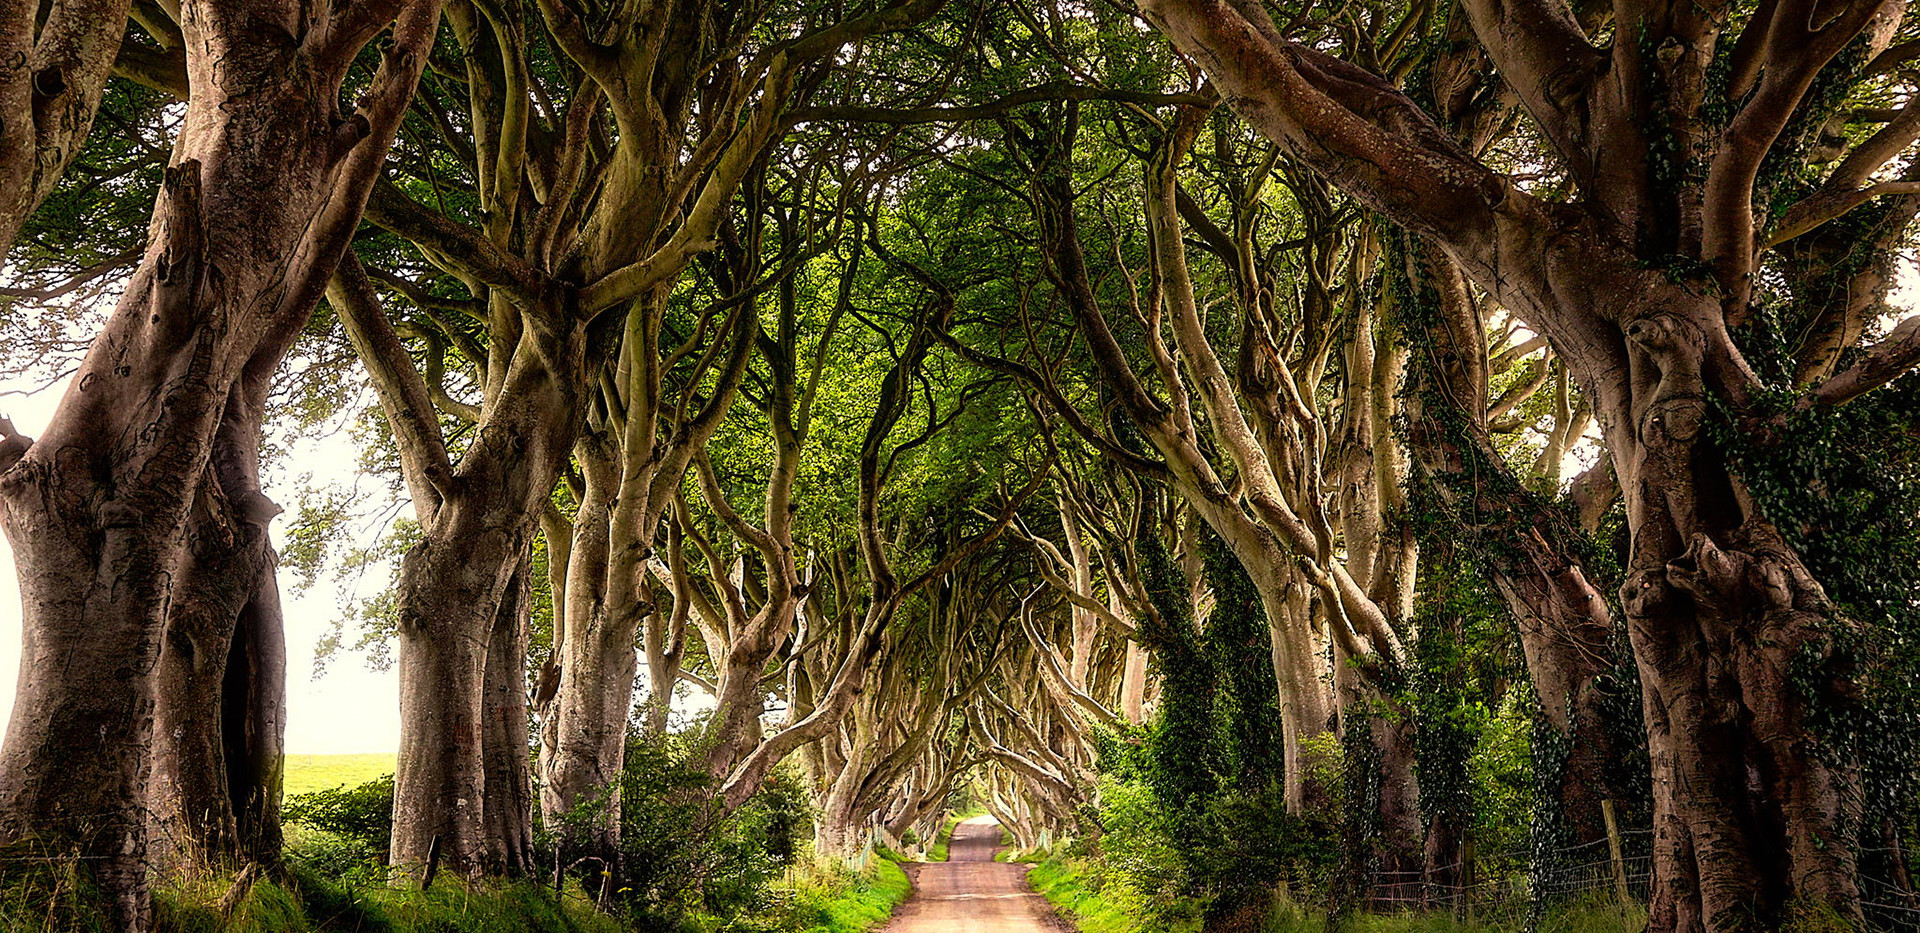 The-Dark-Hedges-Northern-Ireland-Wallpap